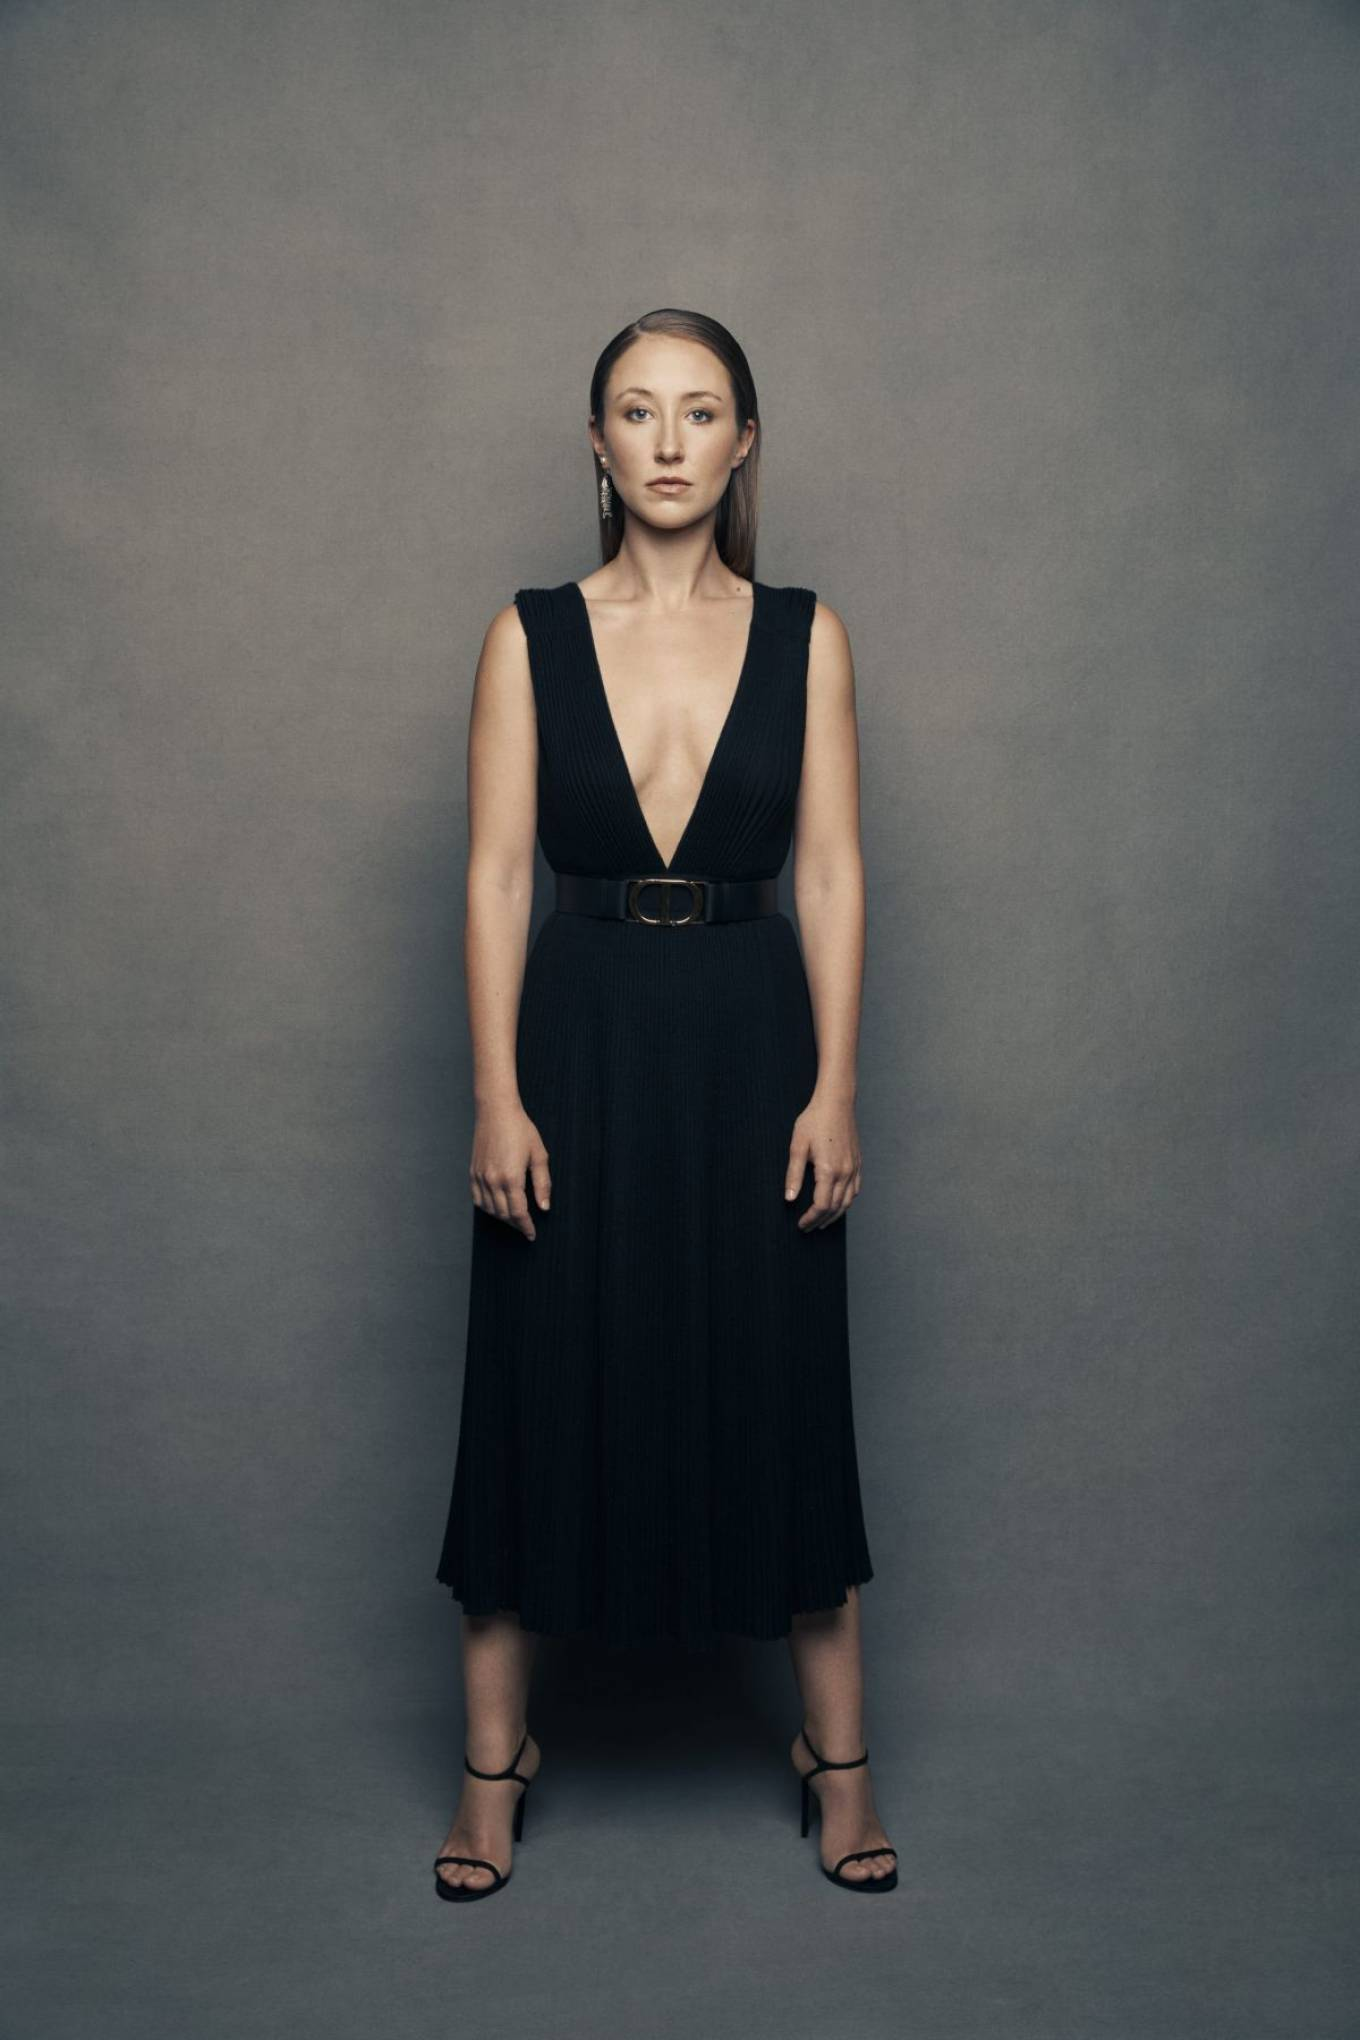 Erin Doherty - Netflix - November 2020